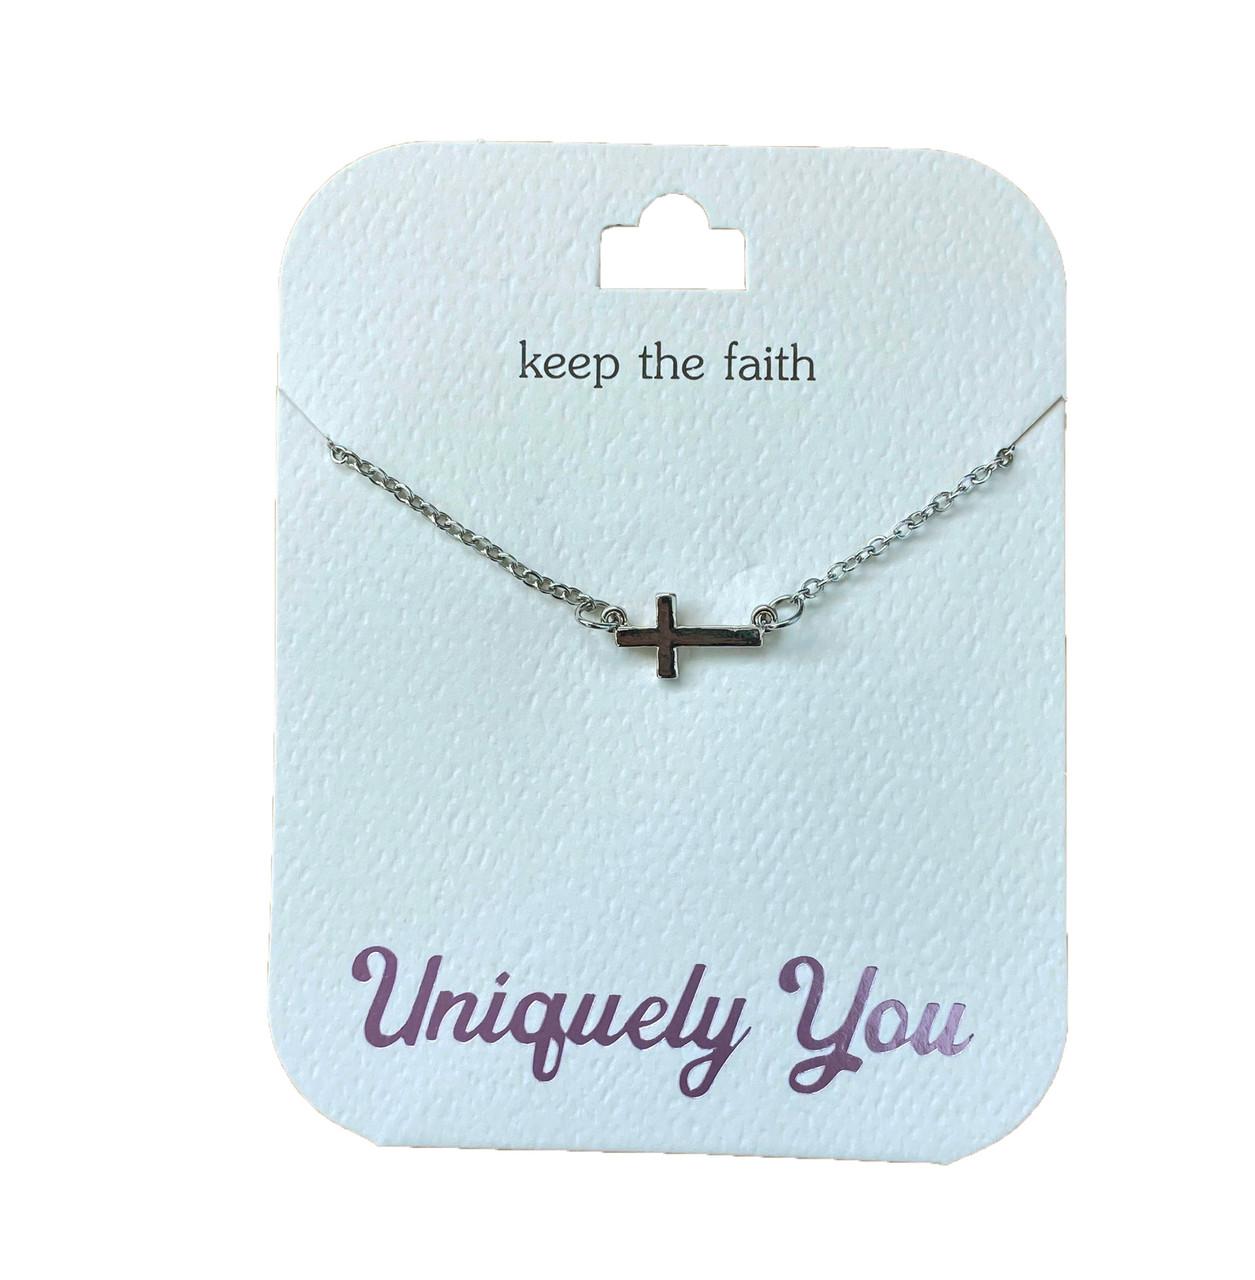 YOU4002 Uniquely You Pendant, Keep the faith